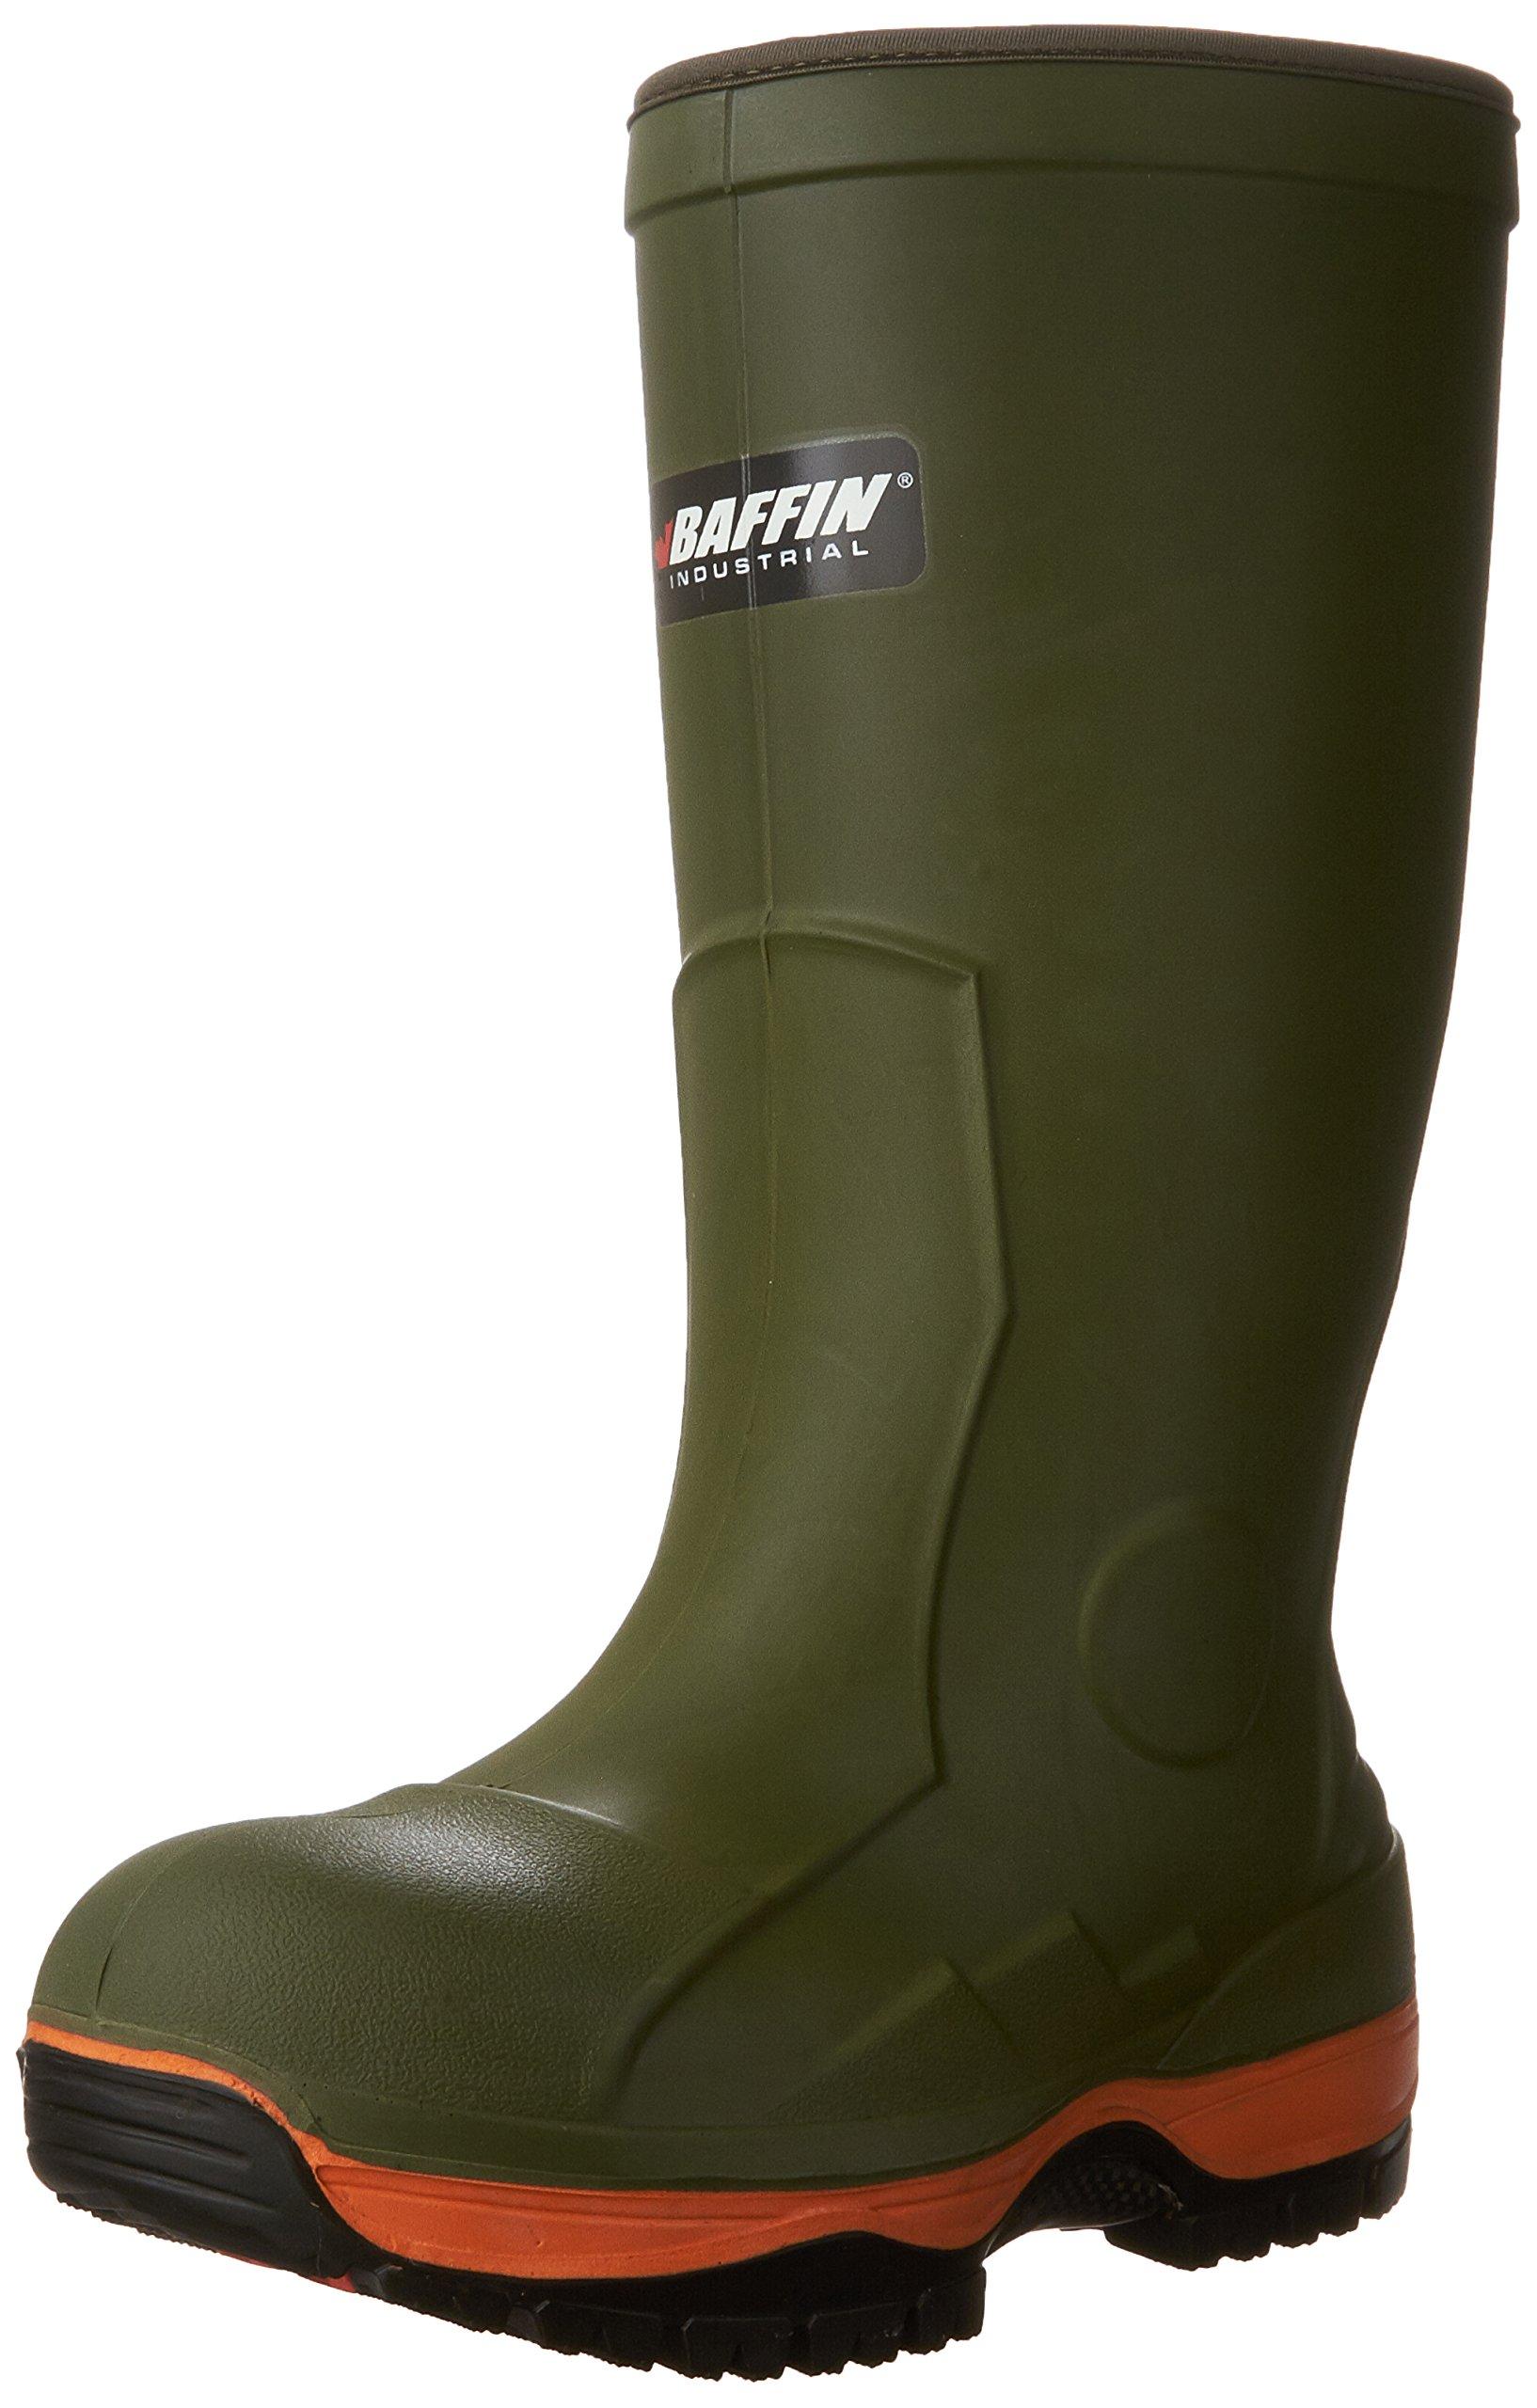 Baffin Men's Icebear Safety Work Boot